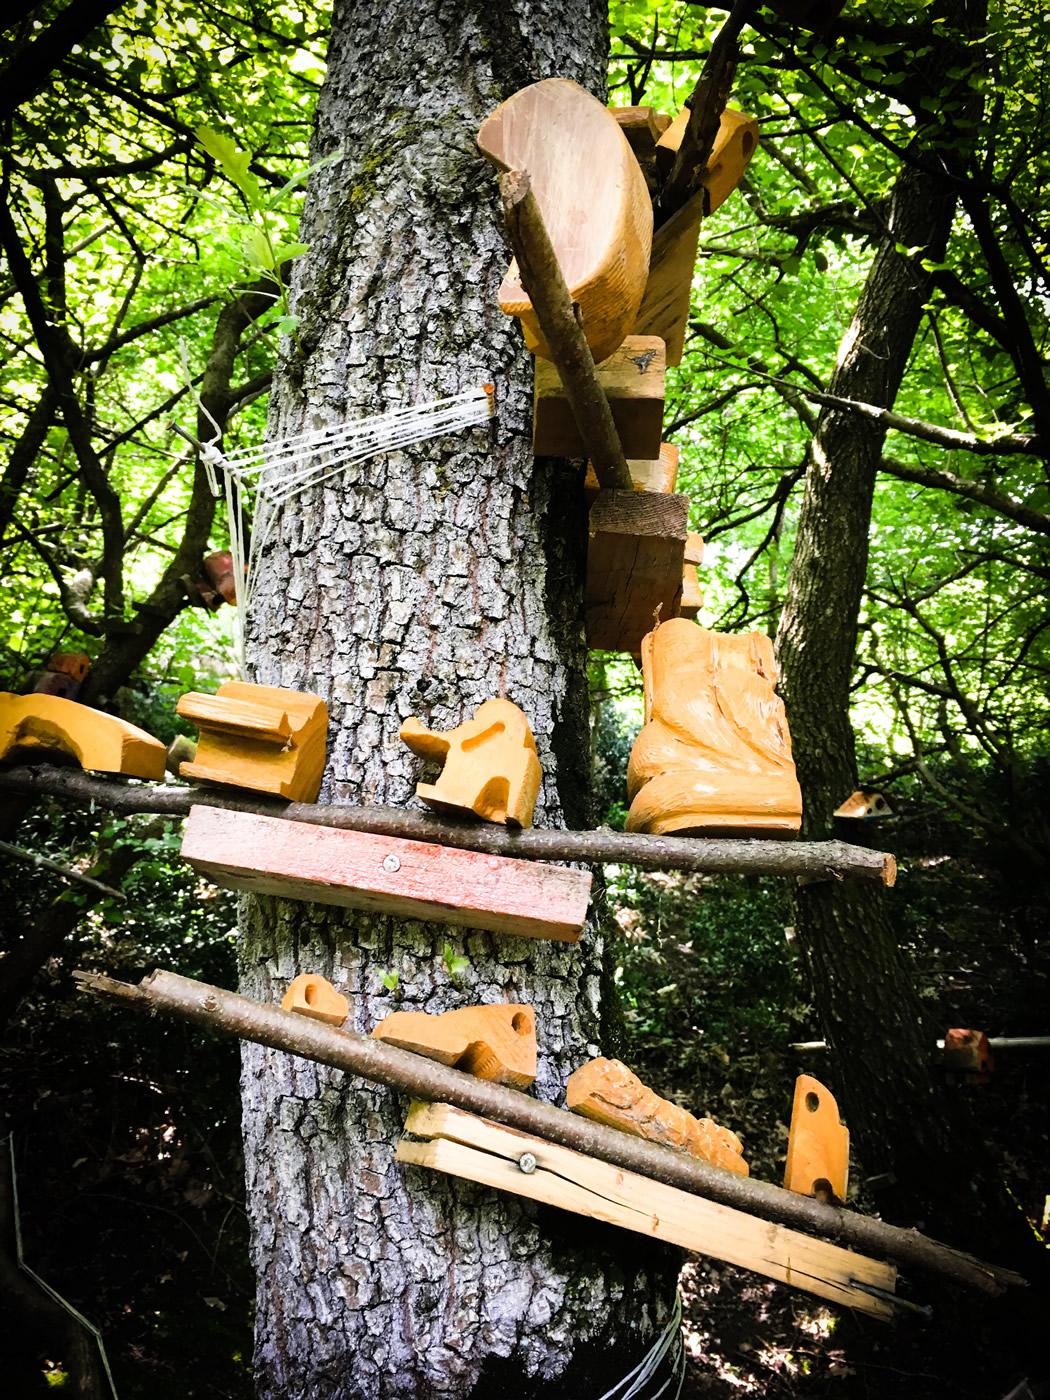 bosco delle meraviglie torino bnb 83 - 4